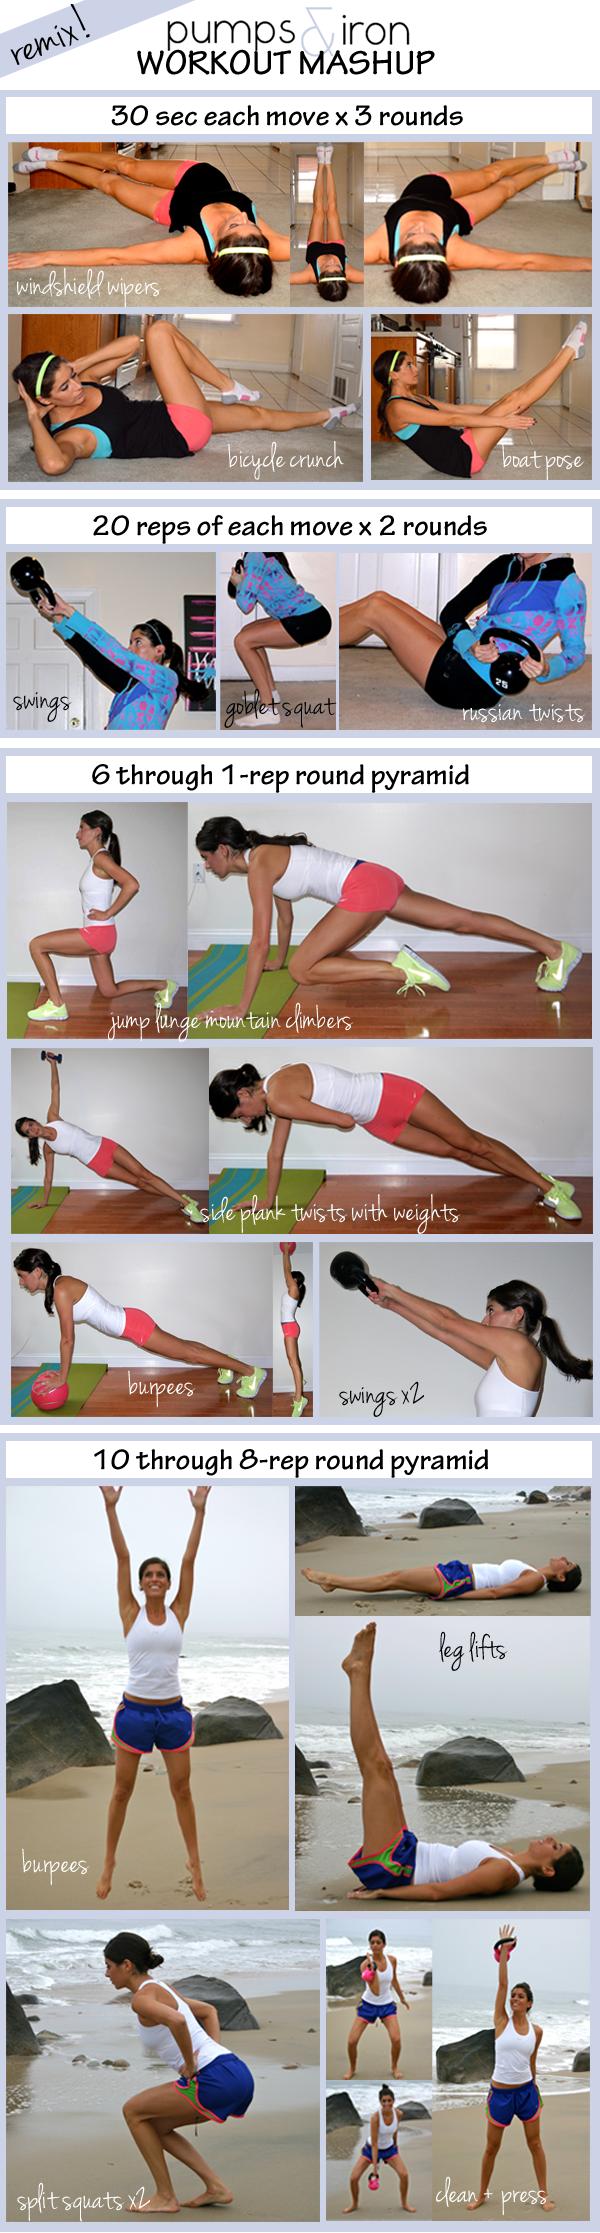 Pumps & Iron workout mashup